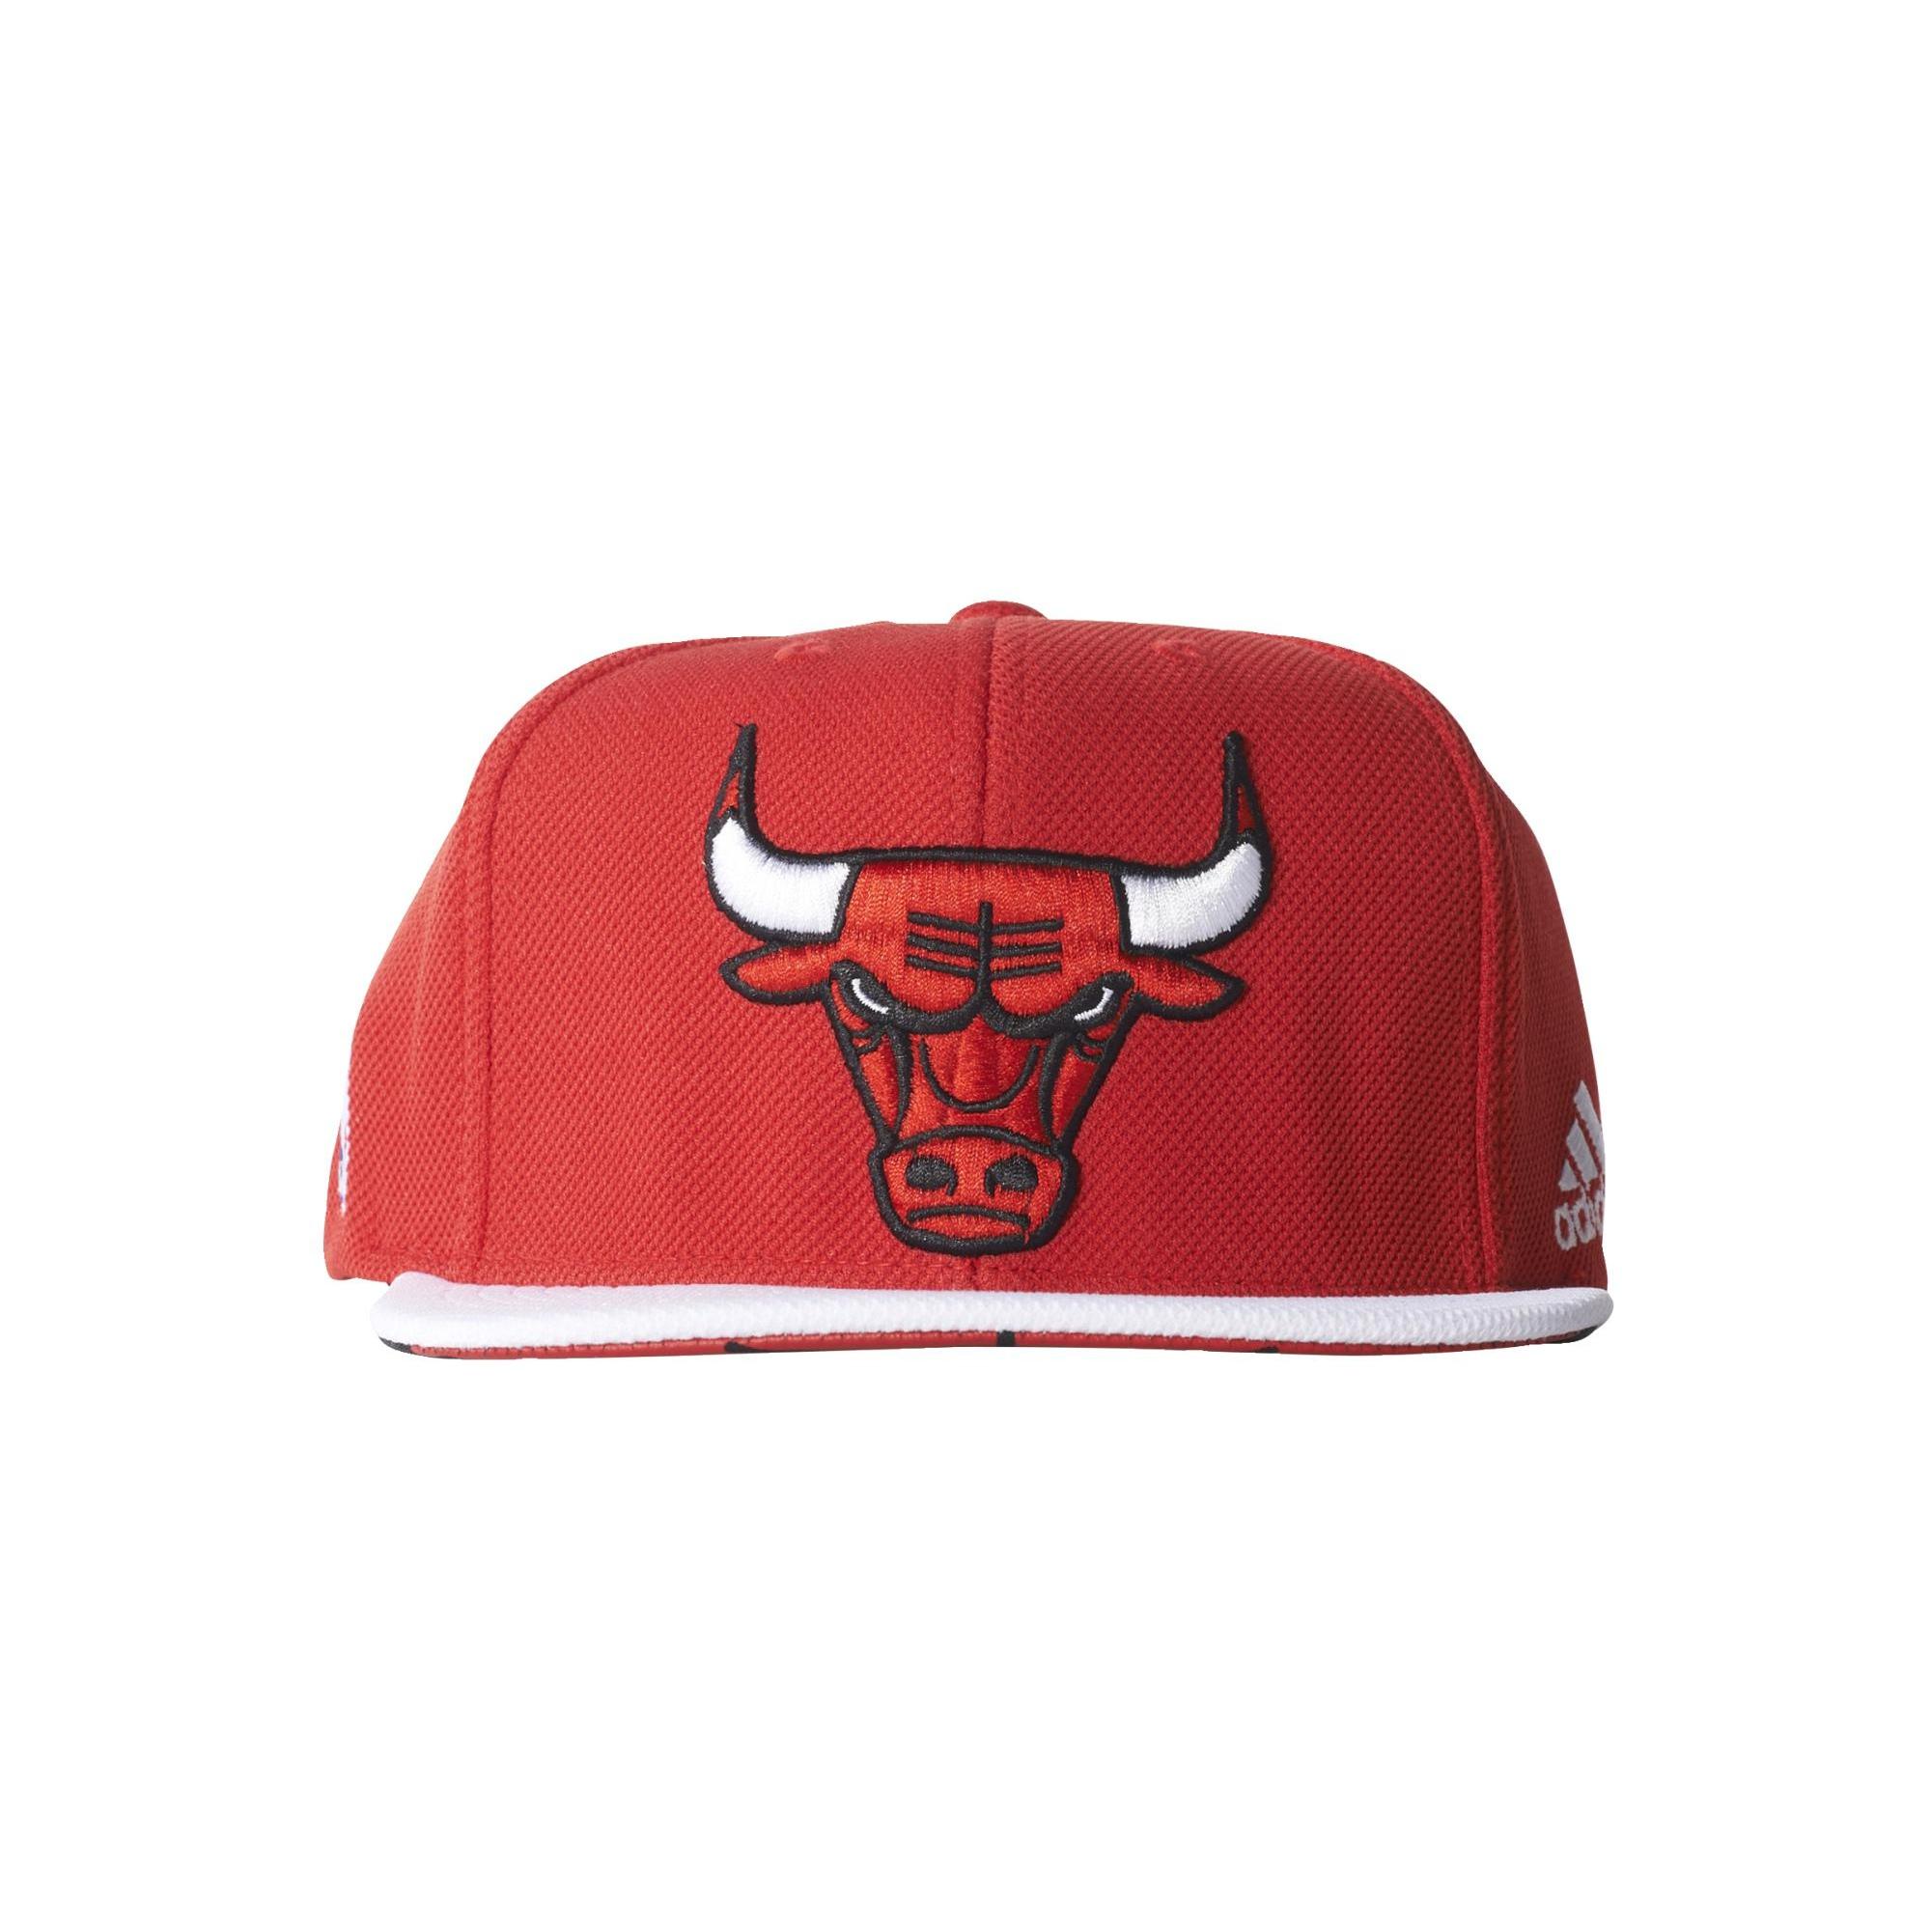 Adidas NBA Gorra Flat Cap Bulls (rojo blanco) 2d8965035bf